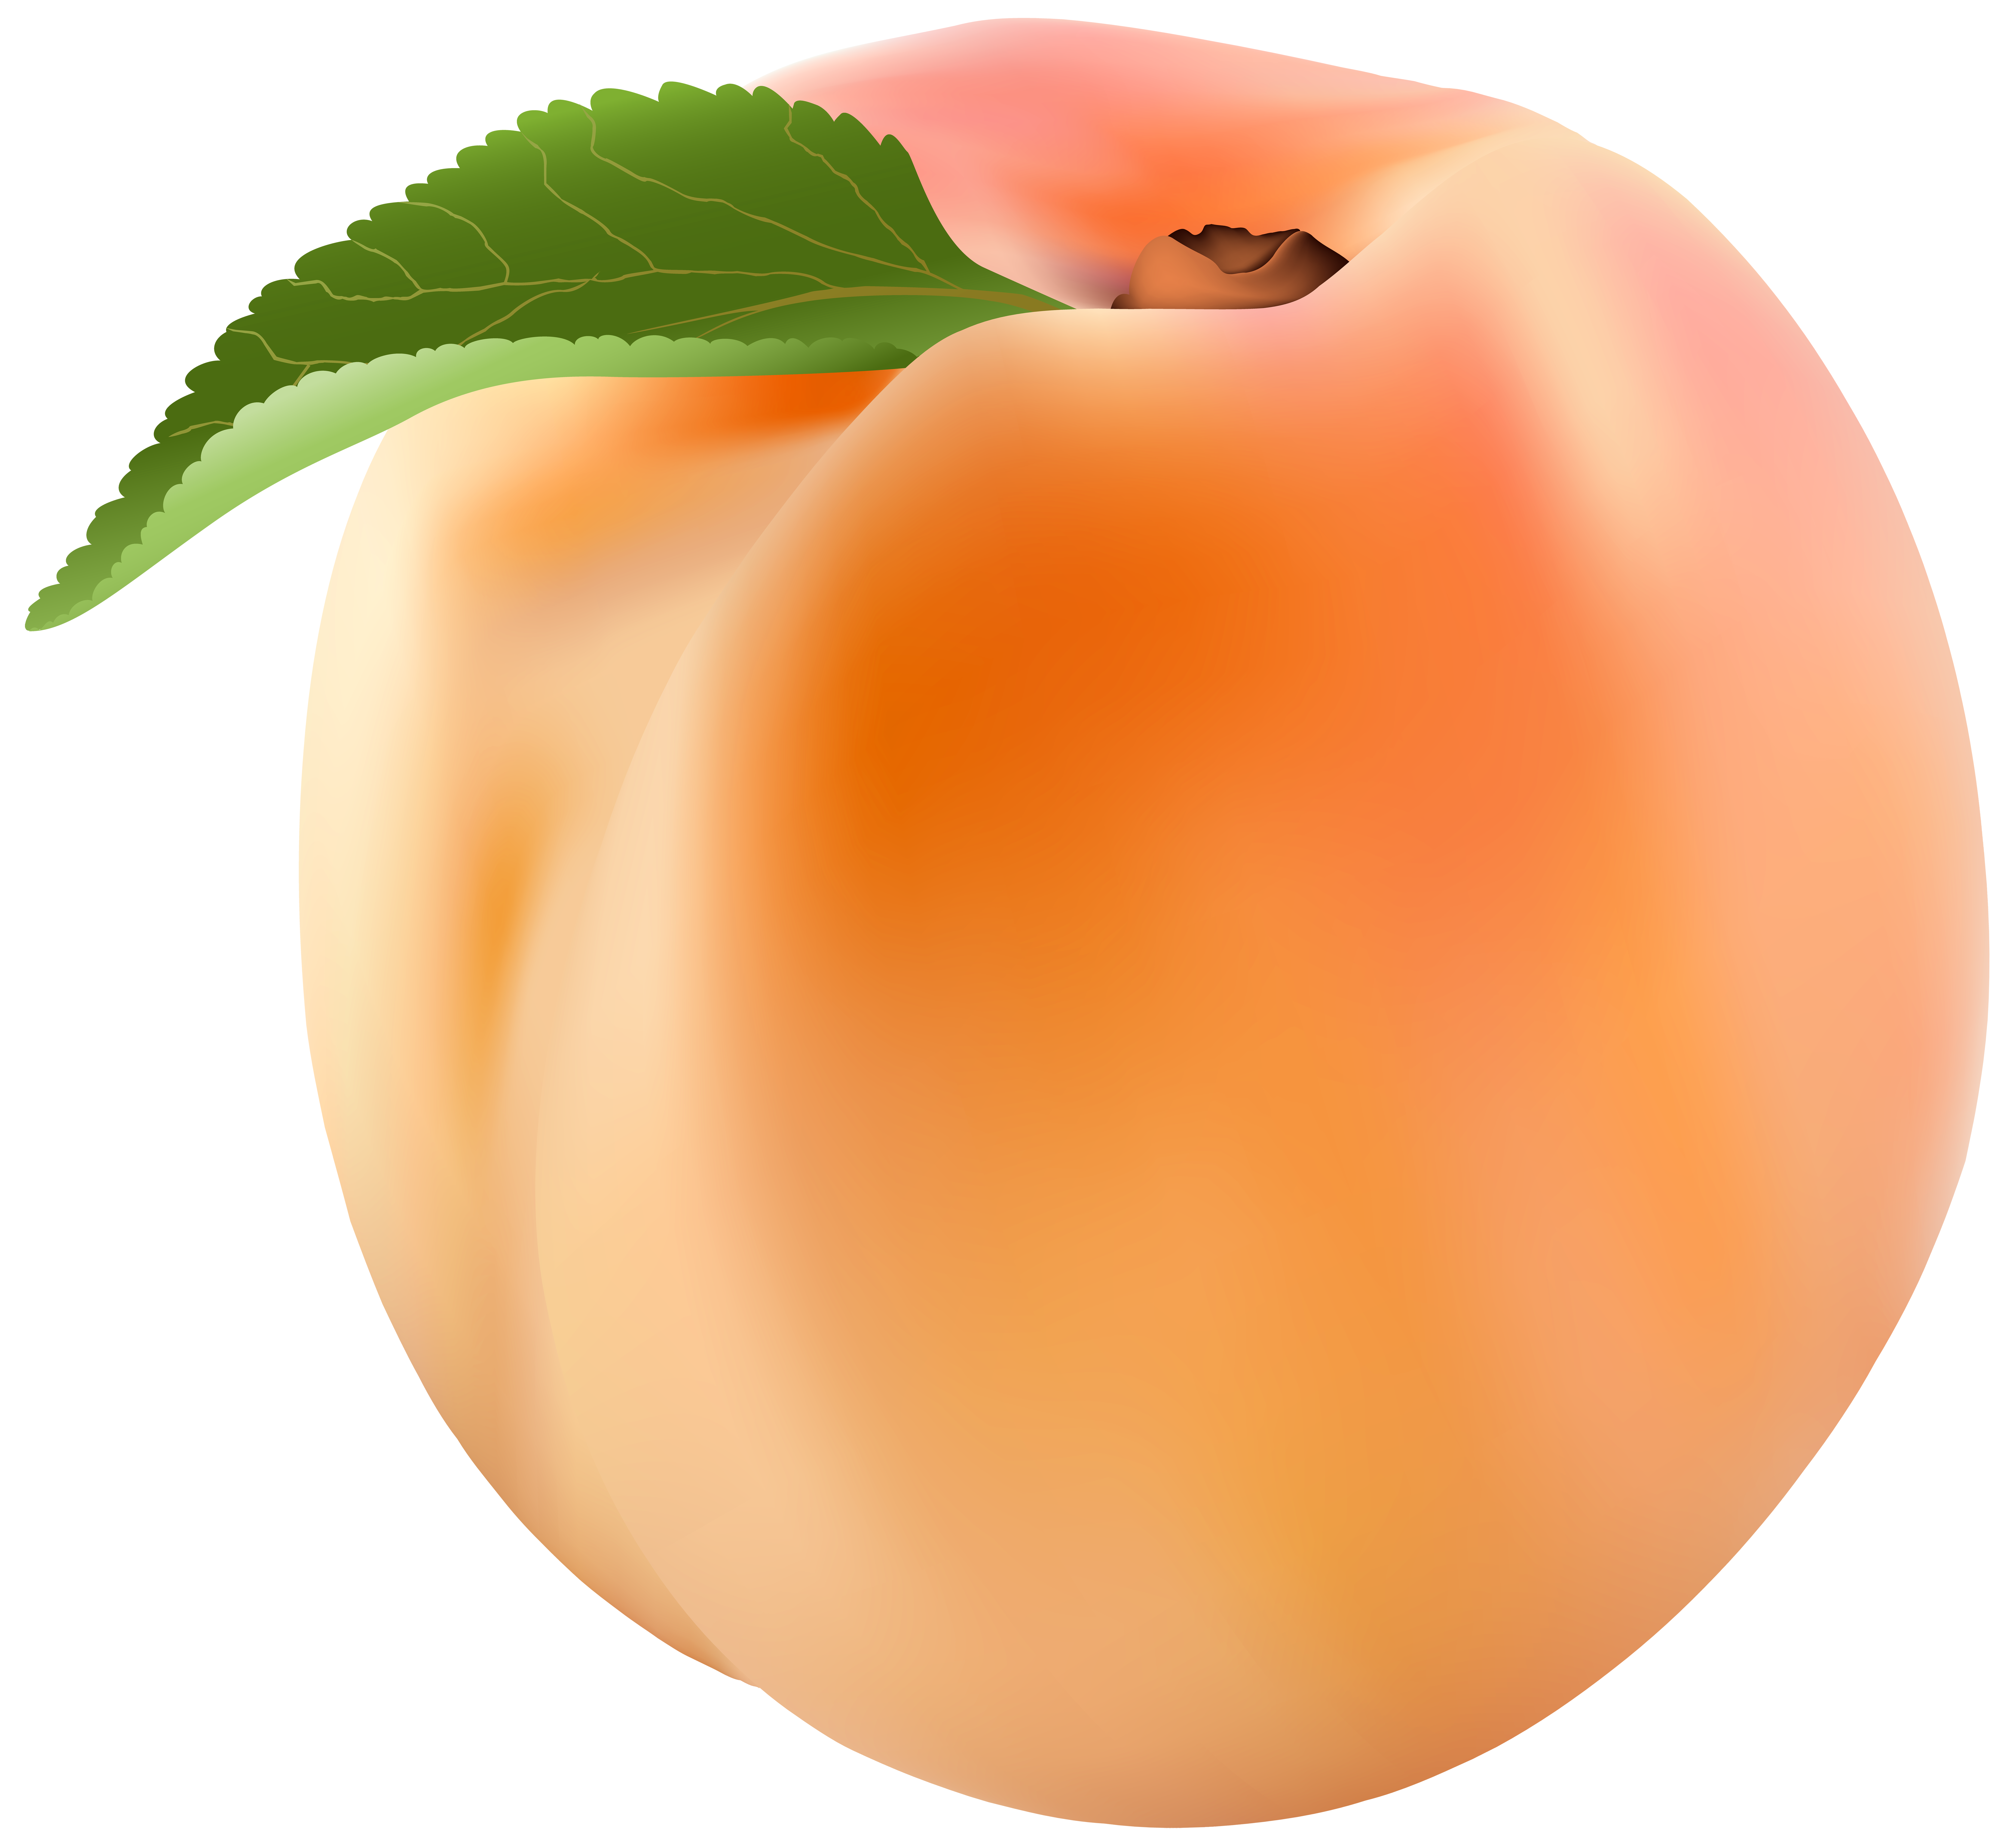 graphic transparent stock Peach png clip art. Peaches clipart orange food.